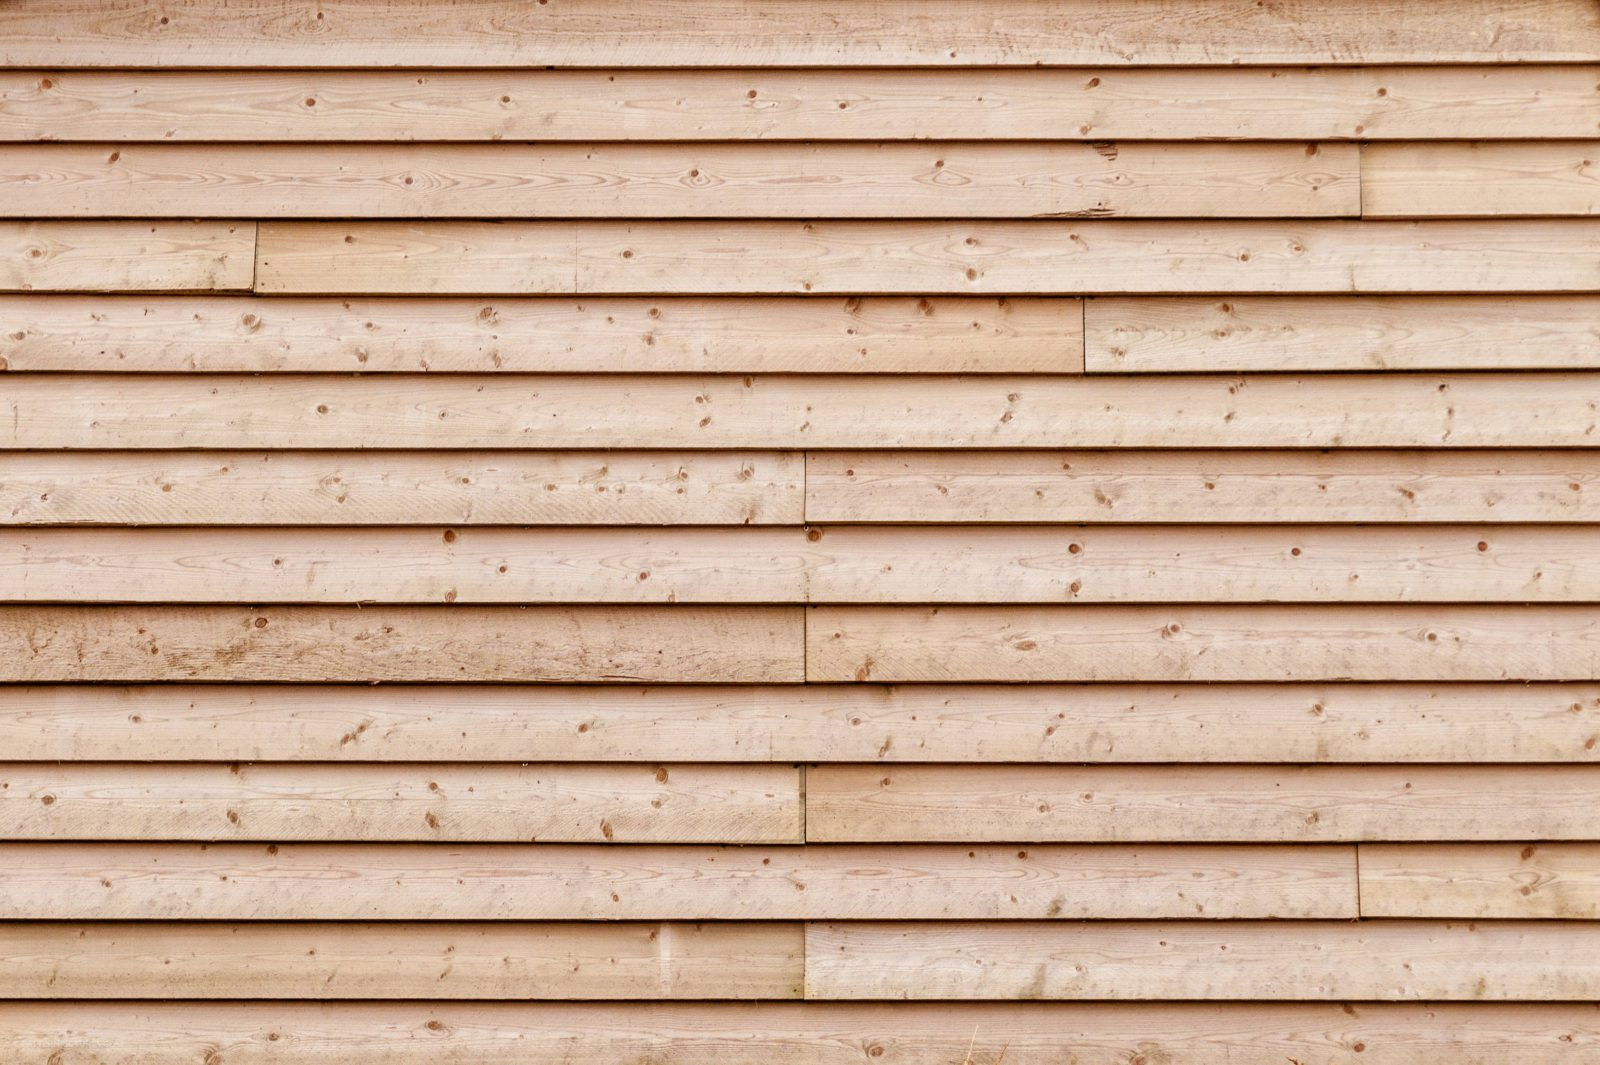 Free stock photo of wood timber oak lumber